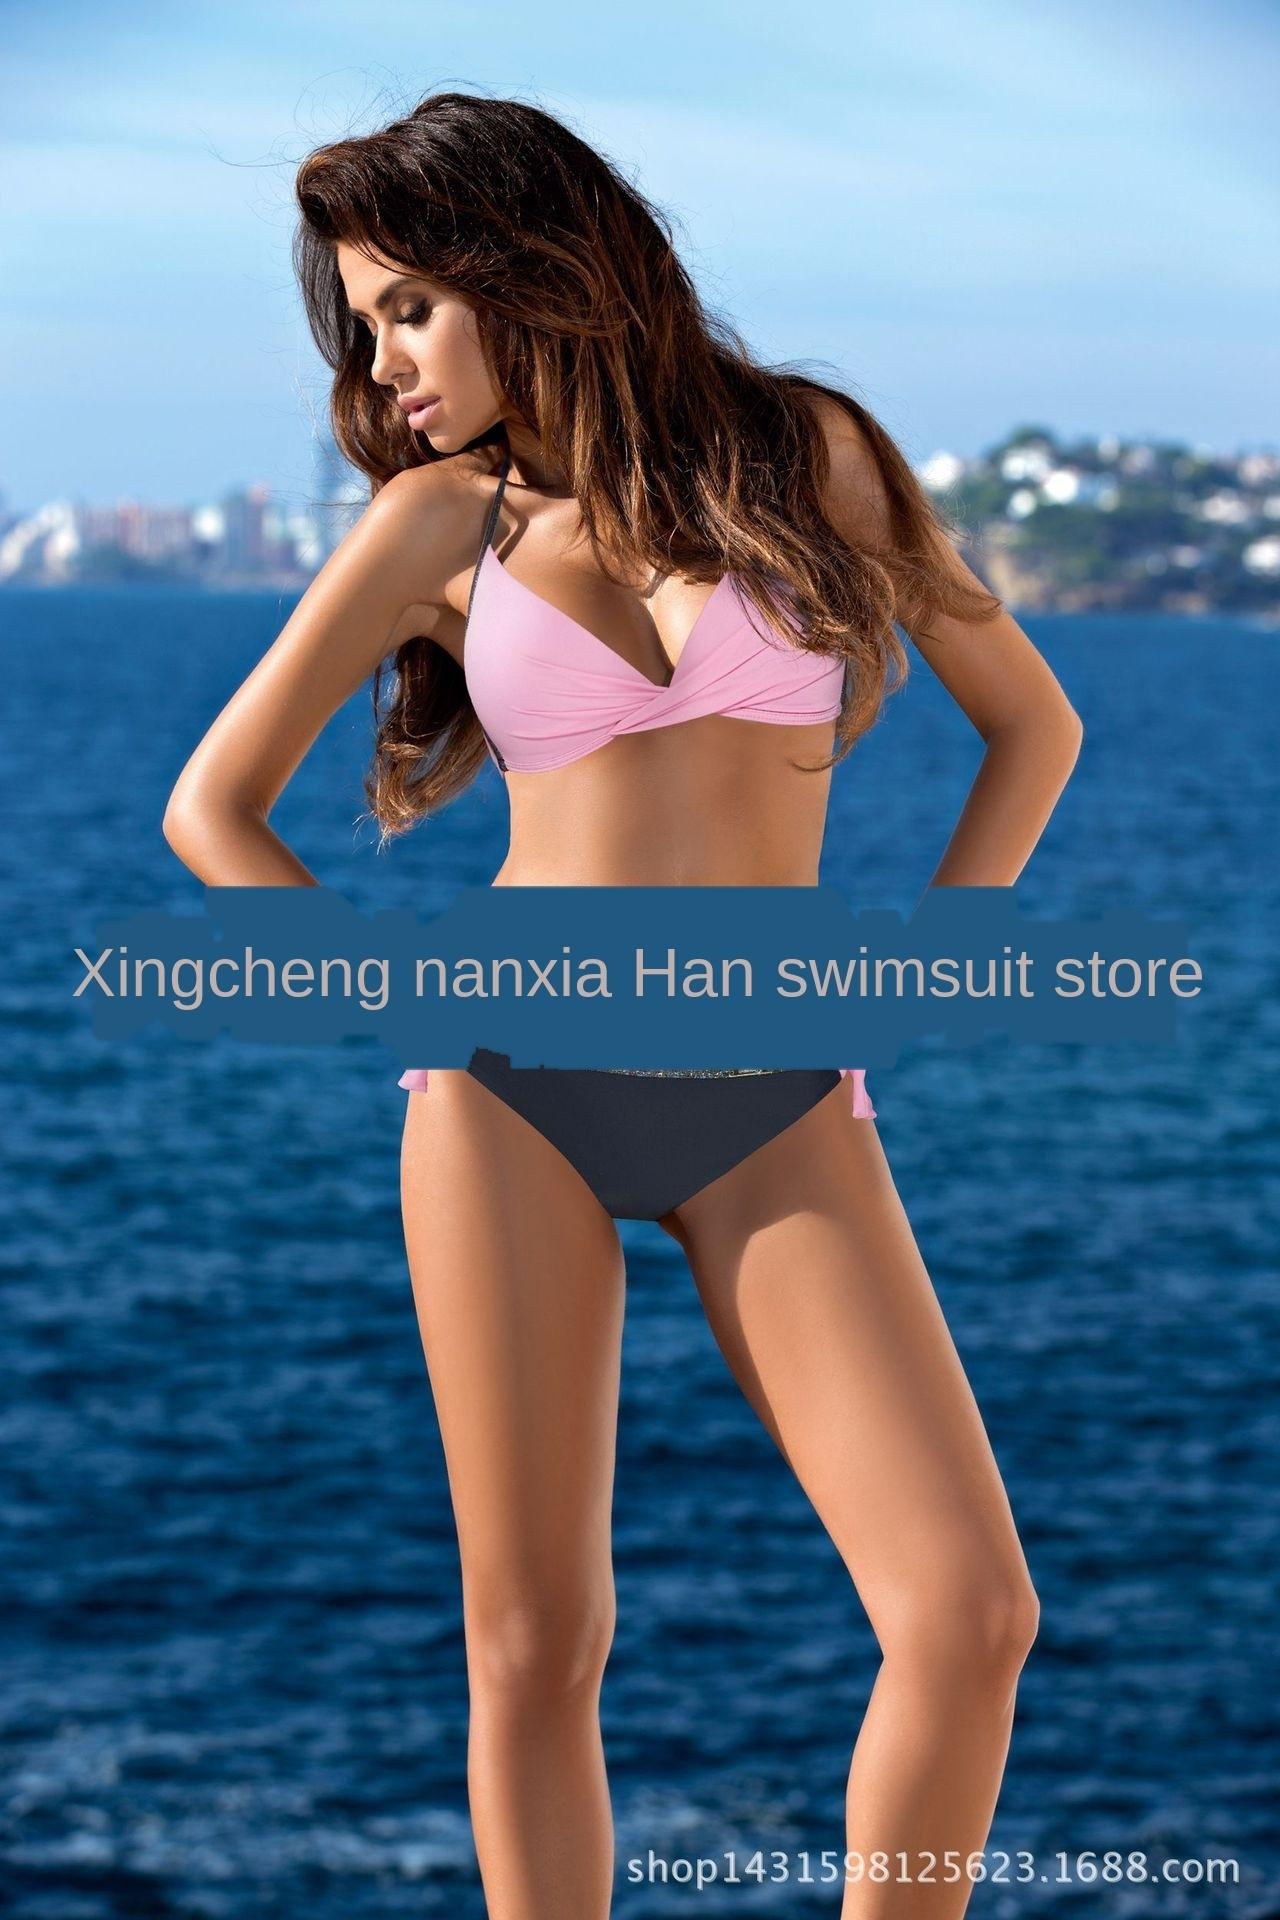 2019 Yeni Çok Renkli büyük boy S-2XL bikini mayo bikini mayo beauti23 renk toplanan